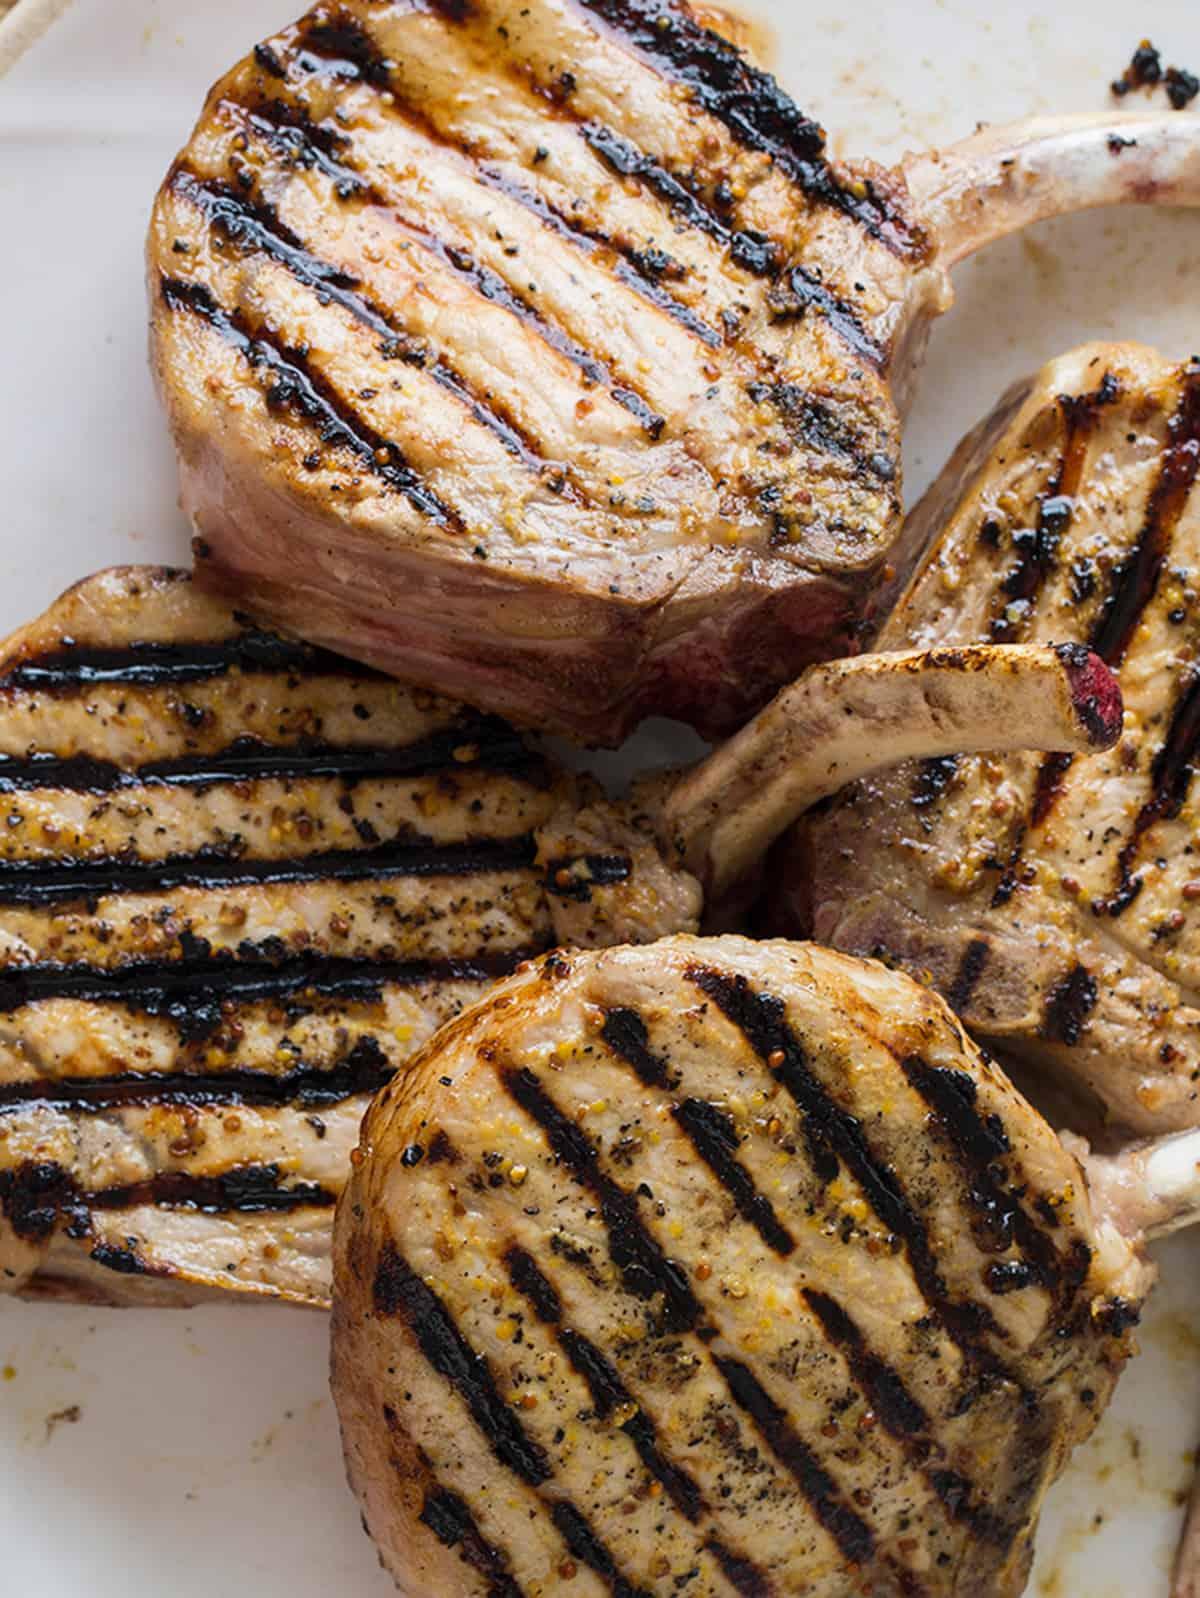 A close up of mustard crusted pork chops.